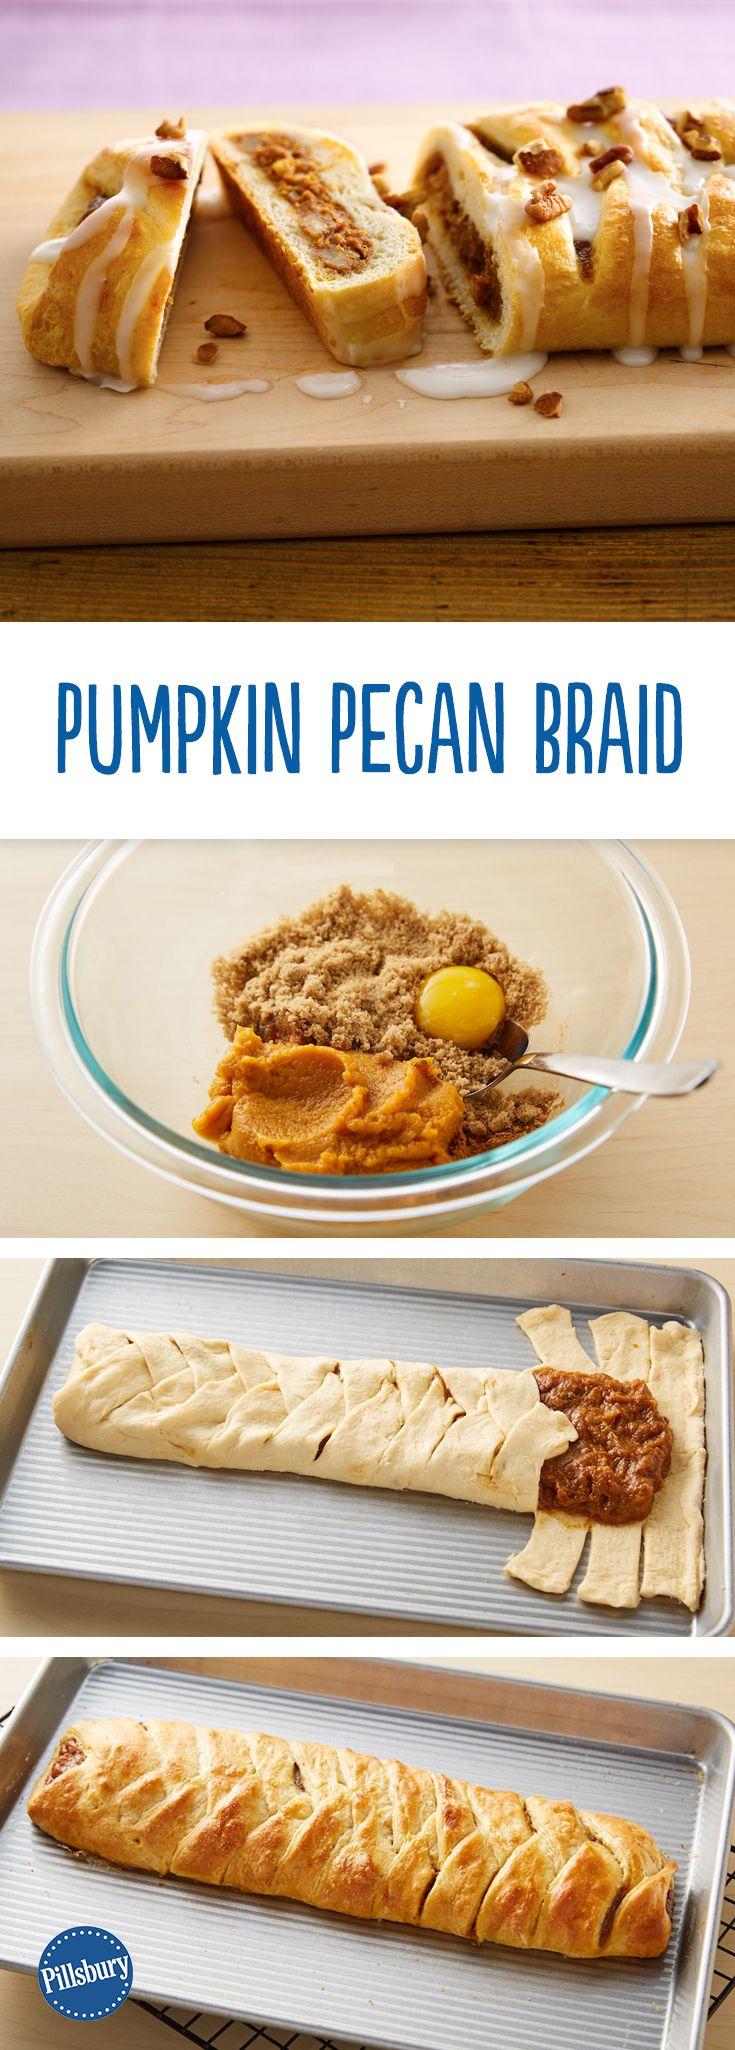 Pumpkin-Pecan Braid: This easy crescent brunch braid is the best excuse to eat pumpkin pie for breakfast.